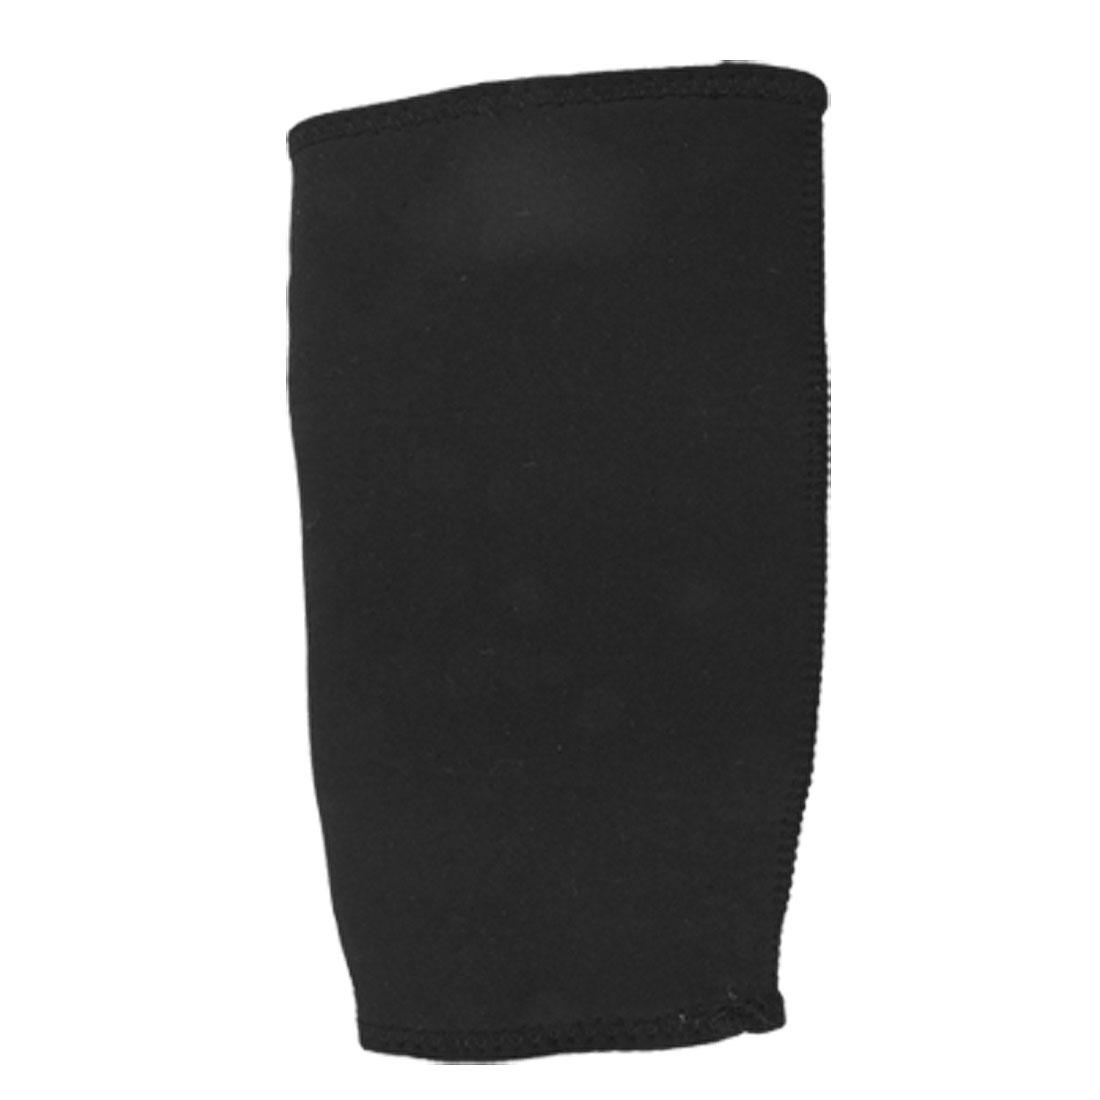 Size M Black Elastic Neoprene Sports Crus Calf Support Protector